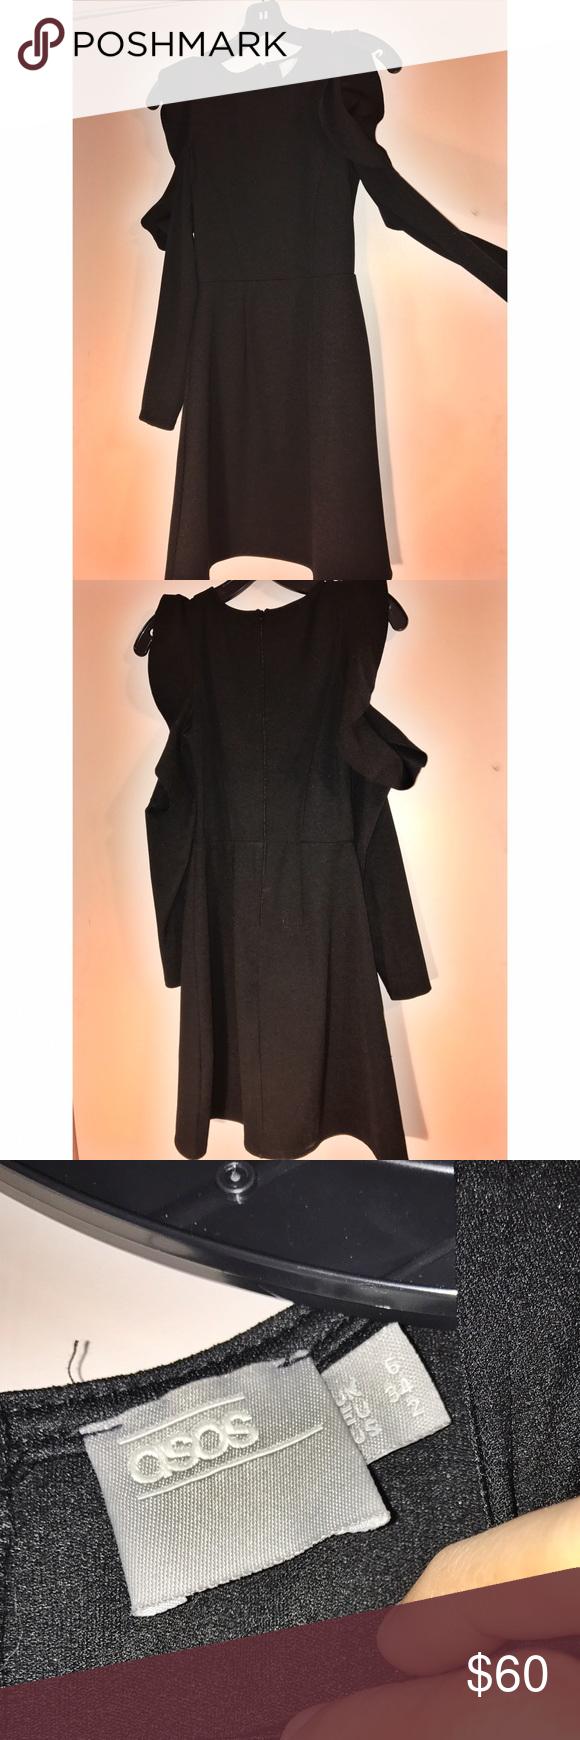 Hpasos long sleeve cold shoulder dress ruffle dress cold